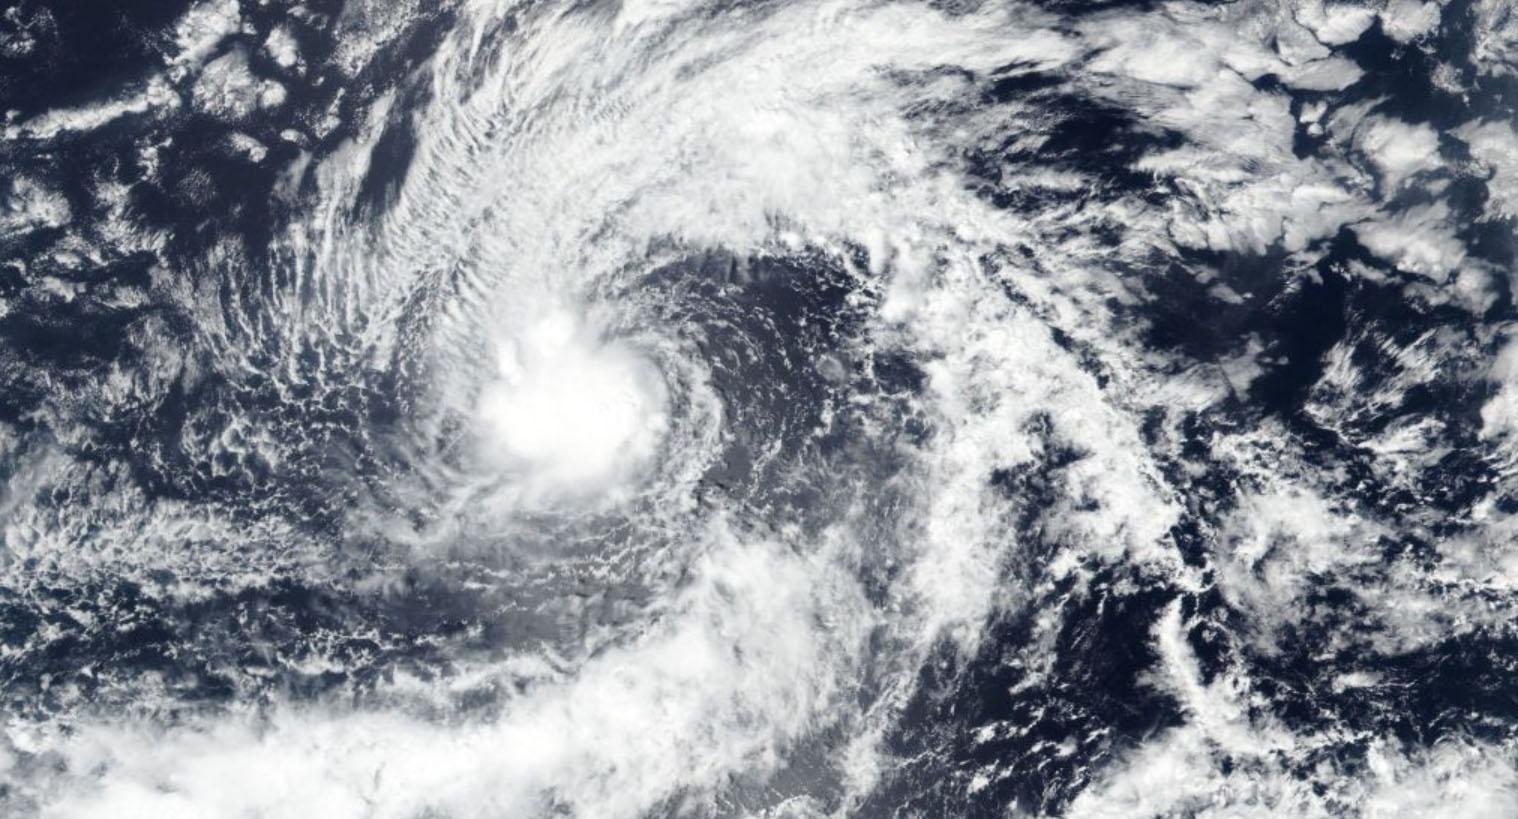 nasa scientist climate change - HD1440×776